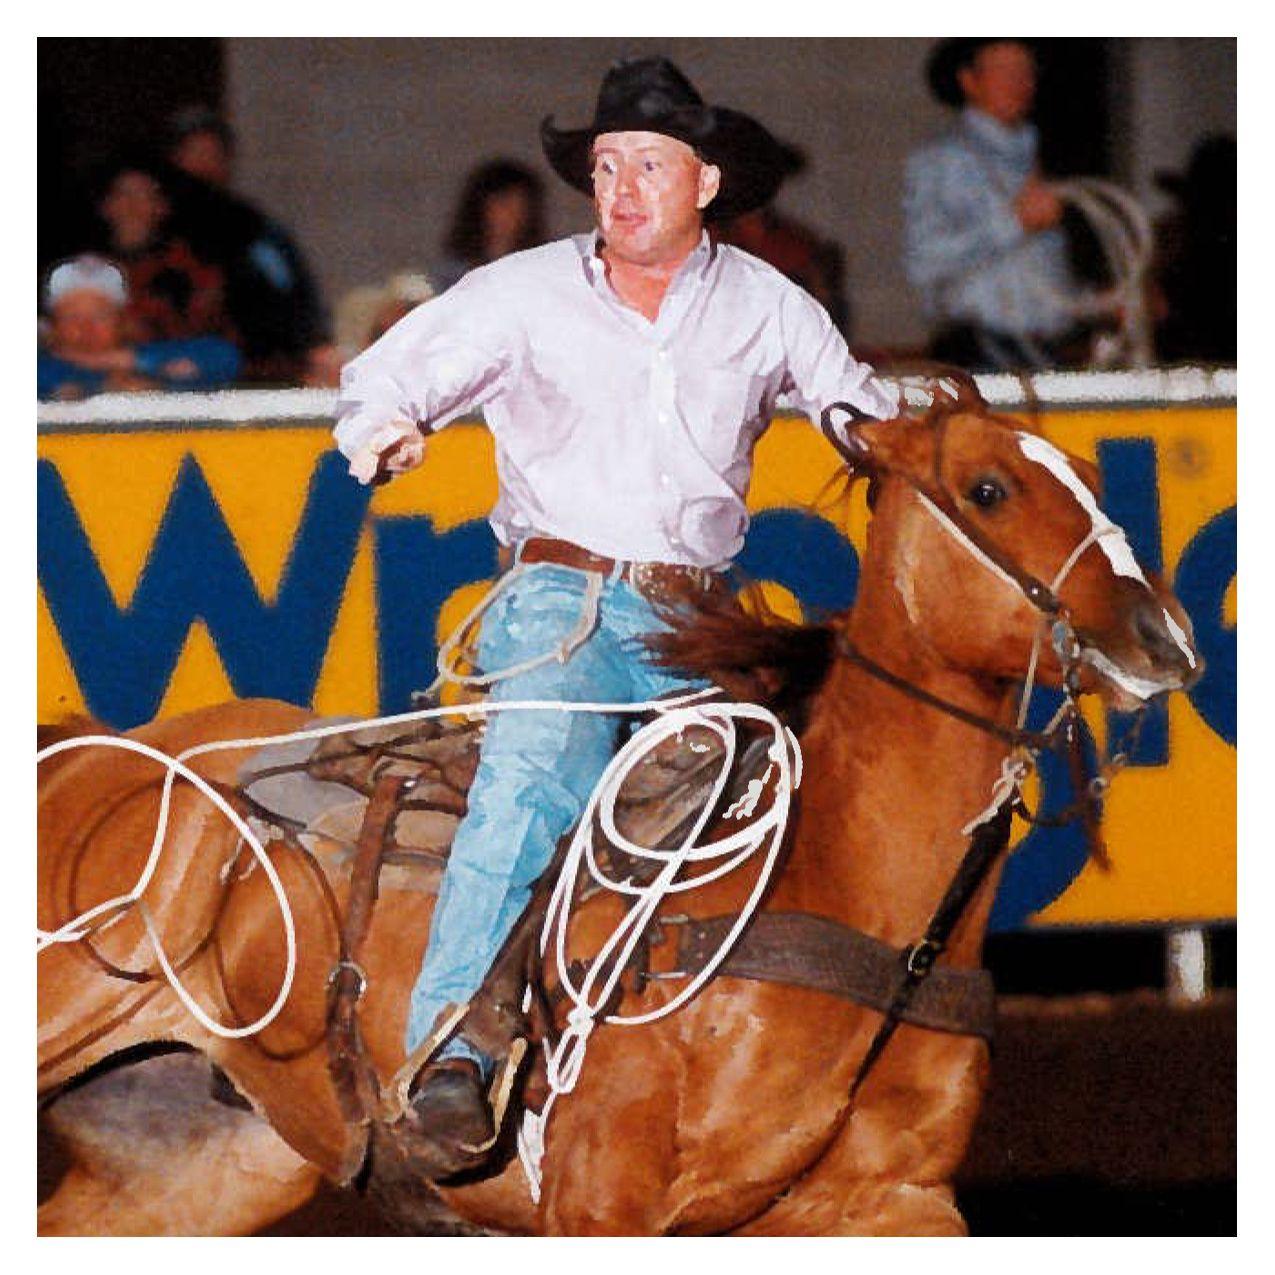 Jim Davis, Steer Roper • Inducted 2007